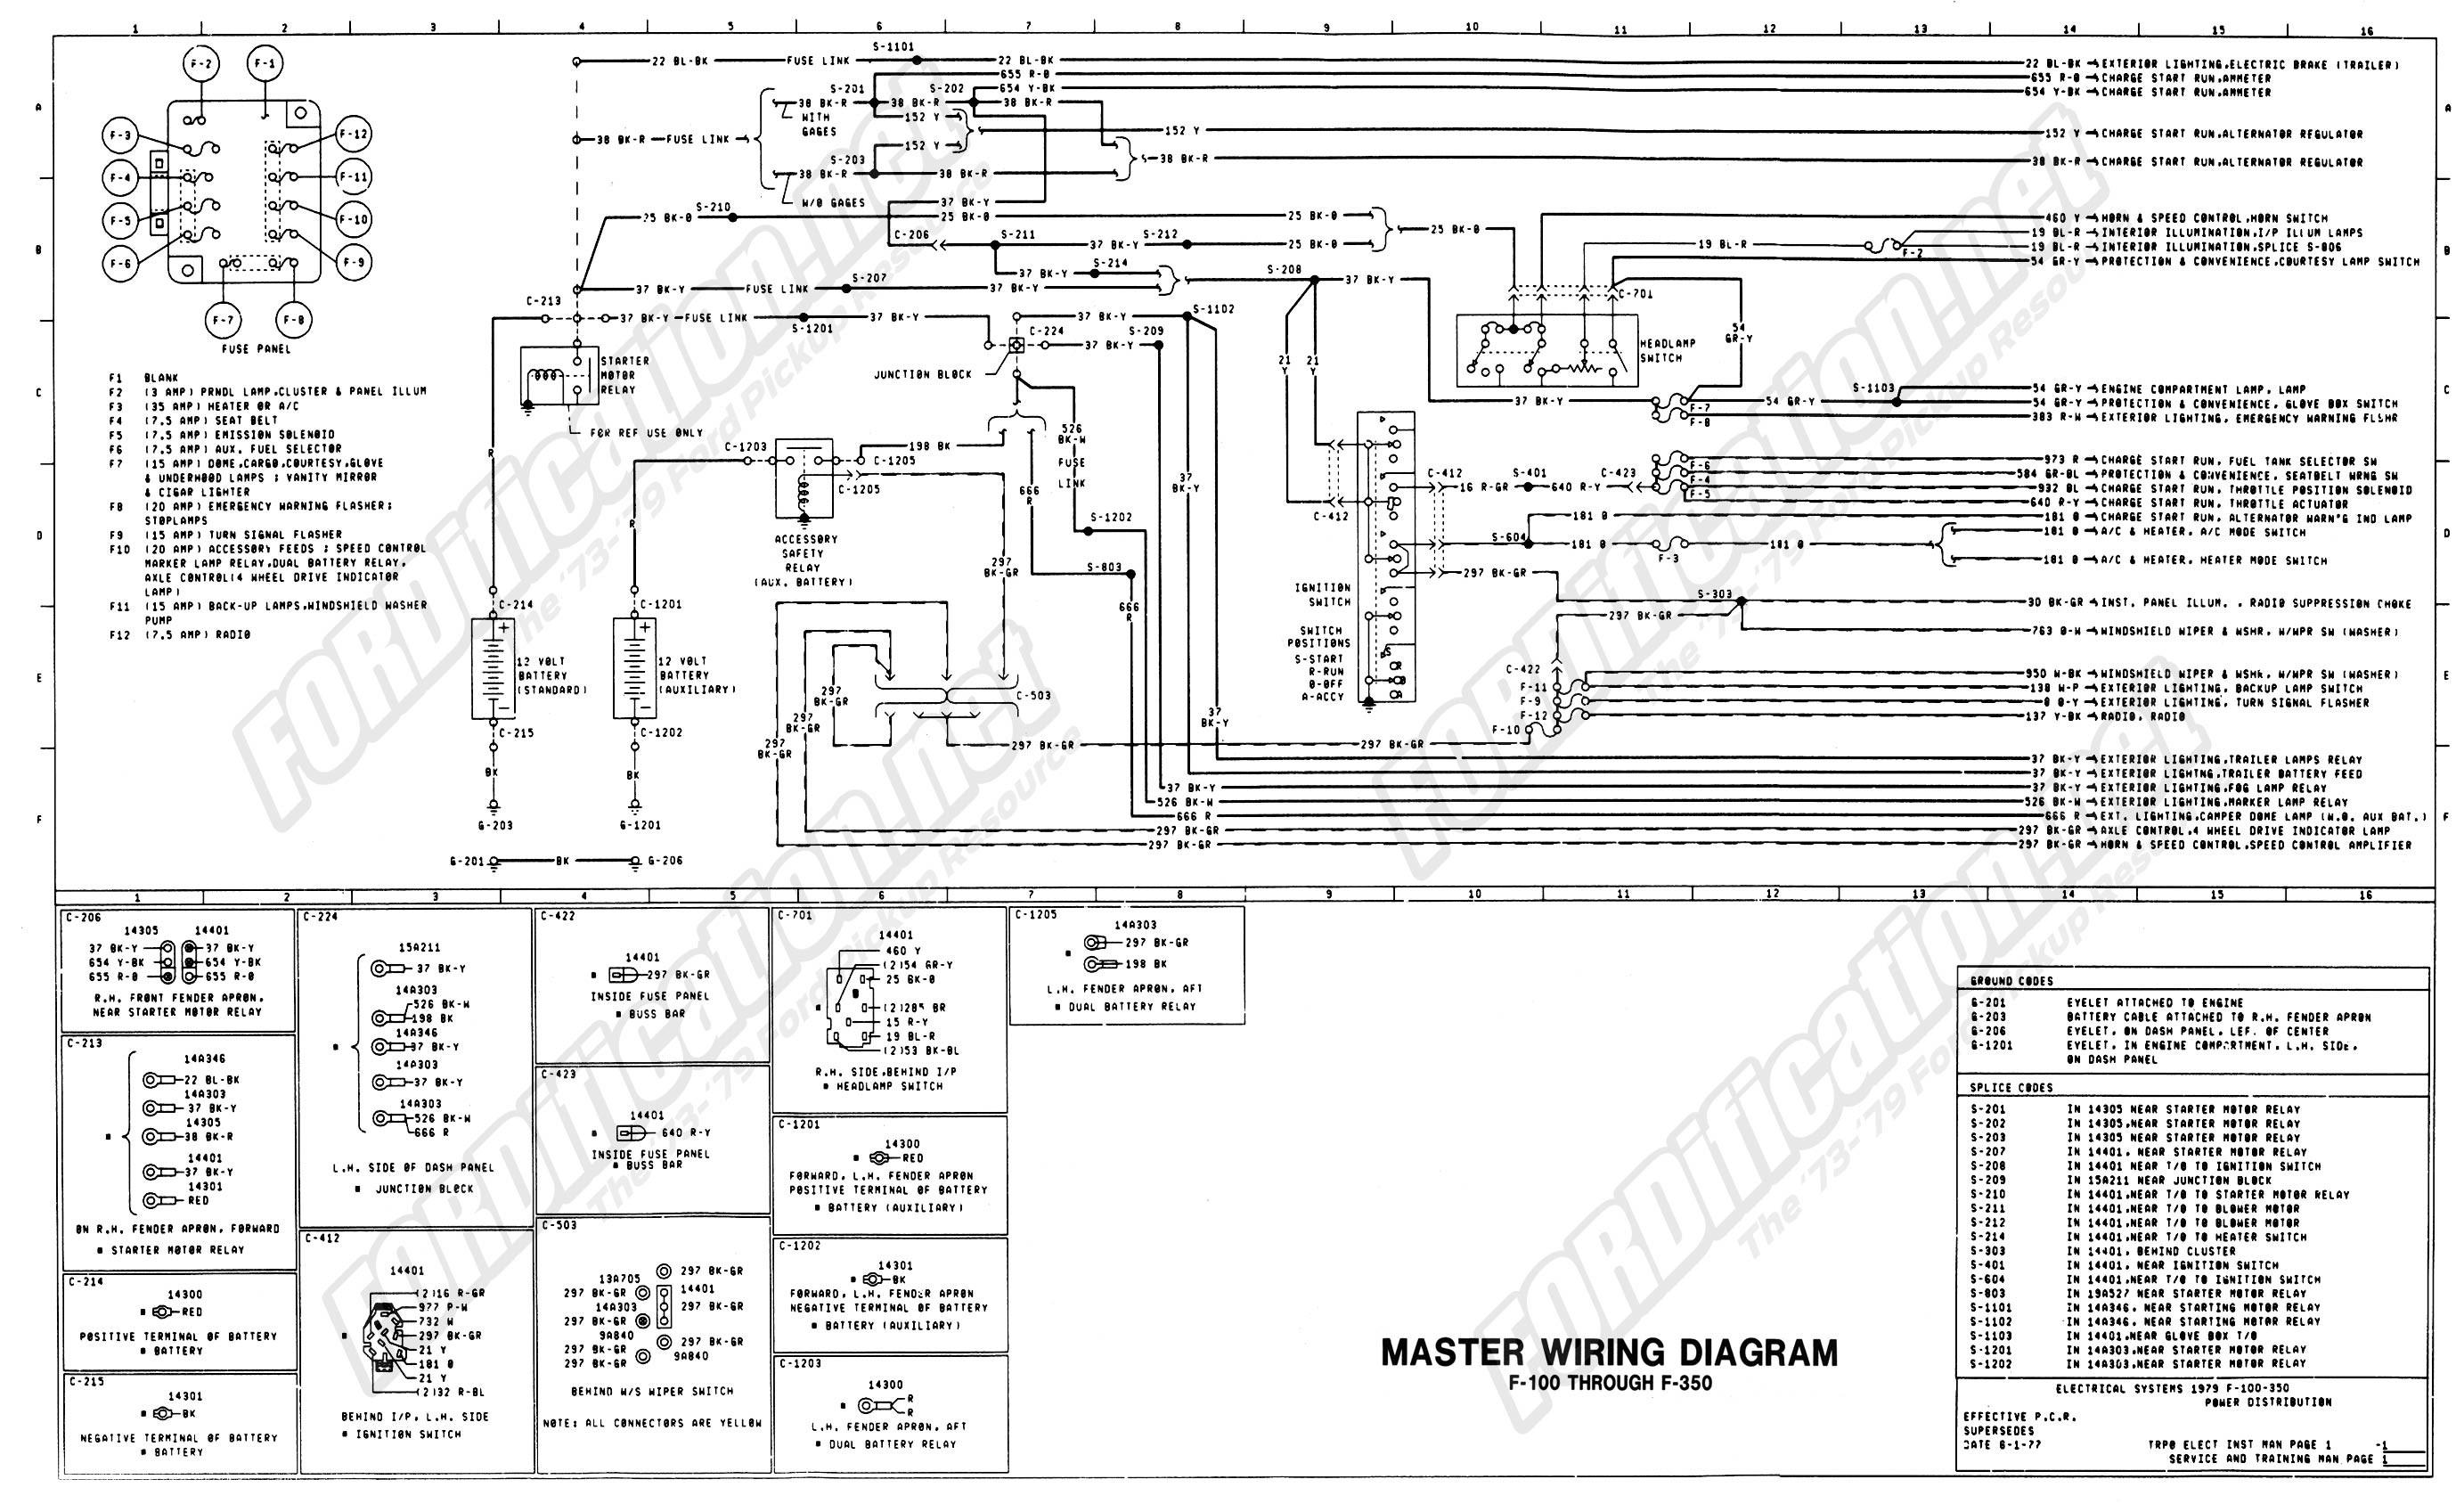 silverado tail light wiring diagram chevy wiring diagrams